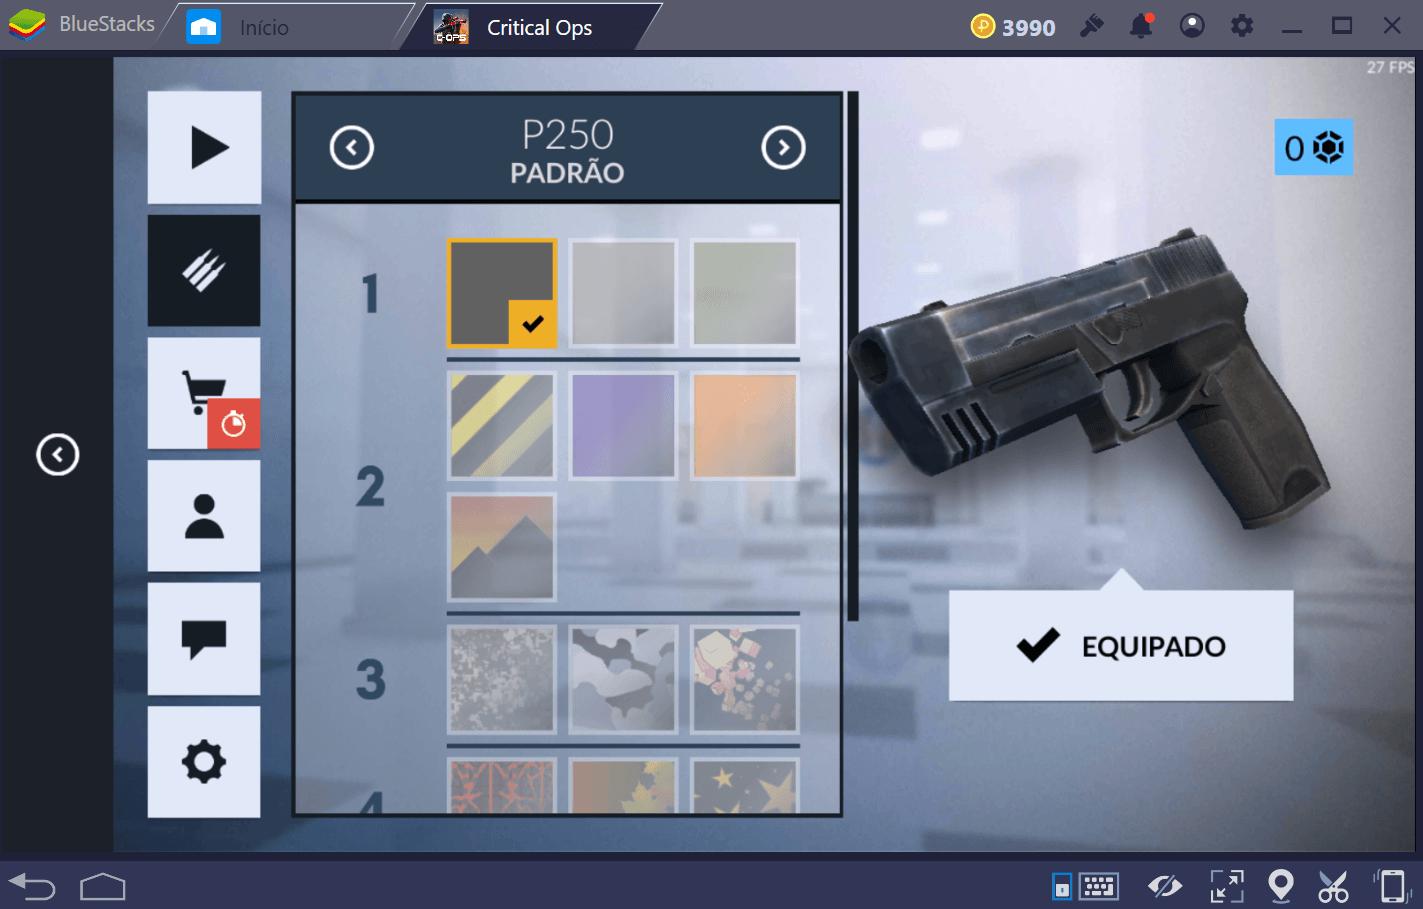 Guia de armas para Critical Ops